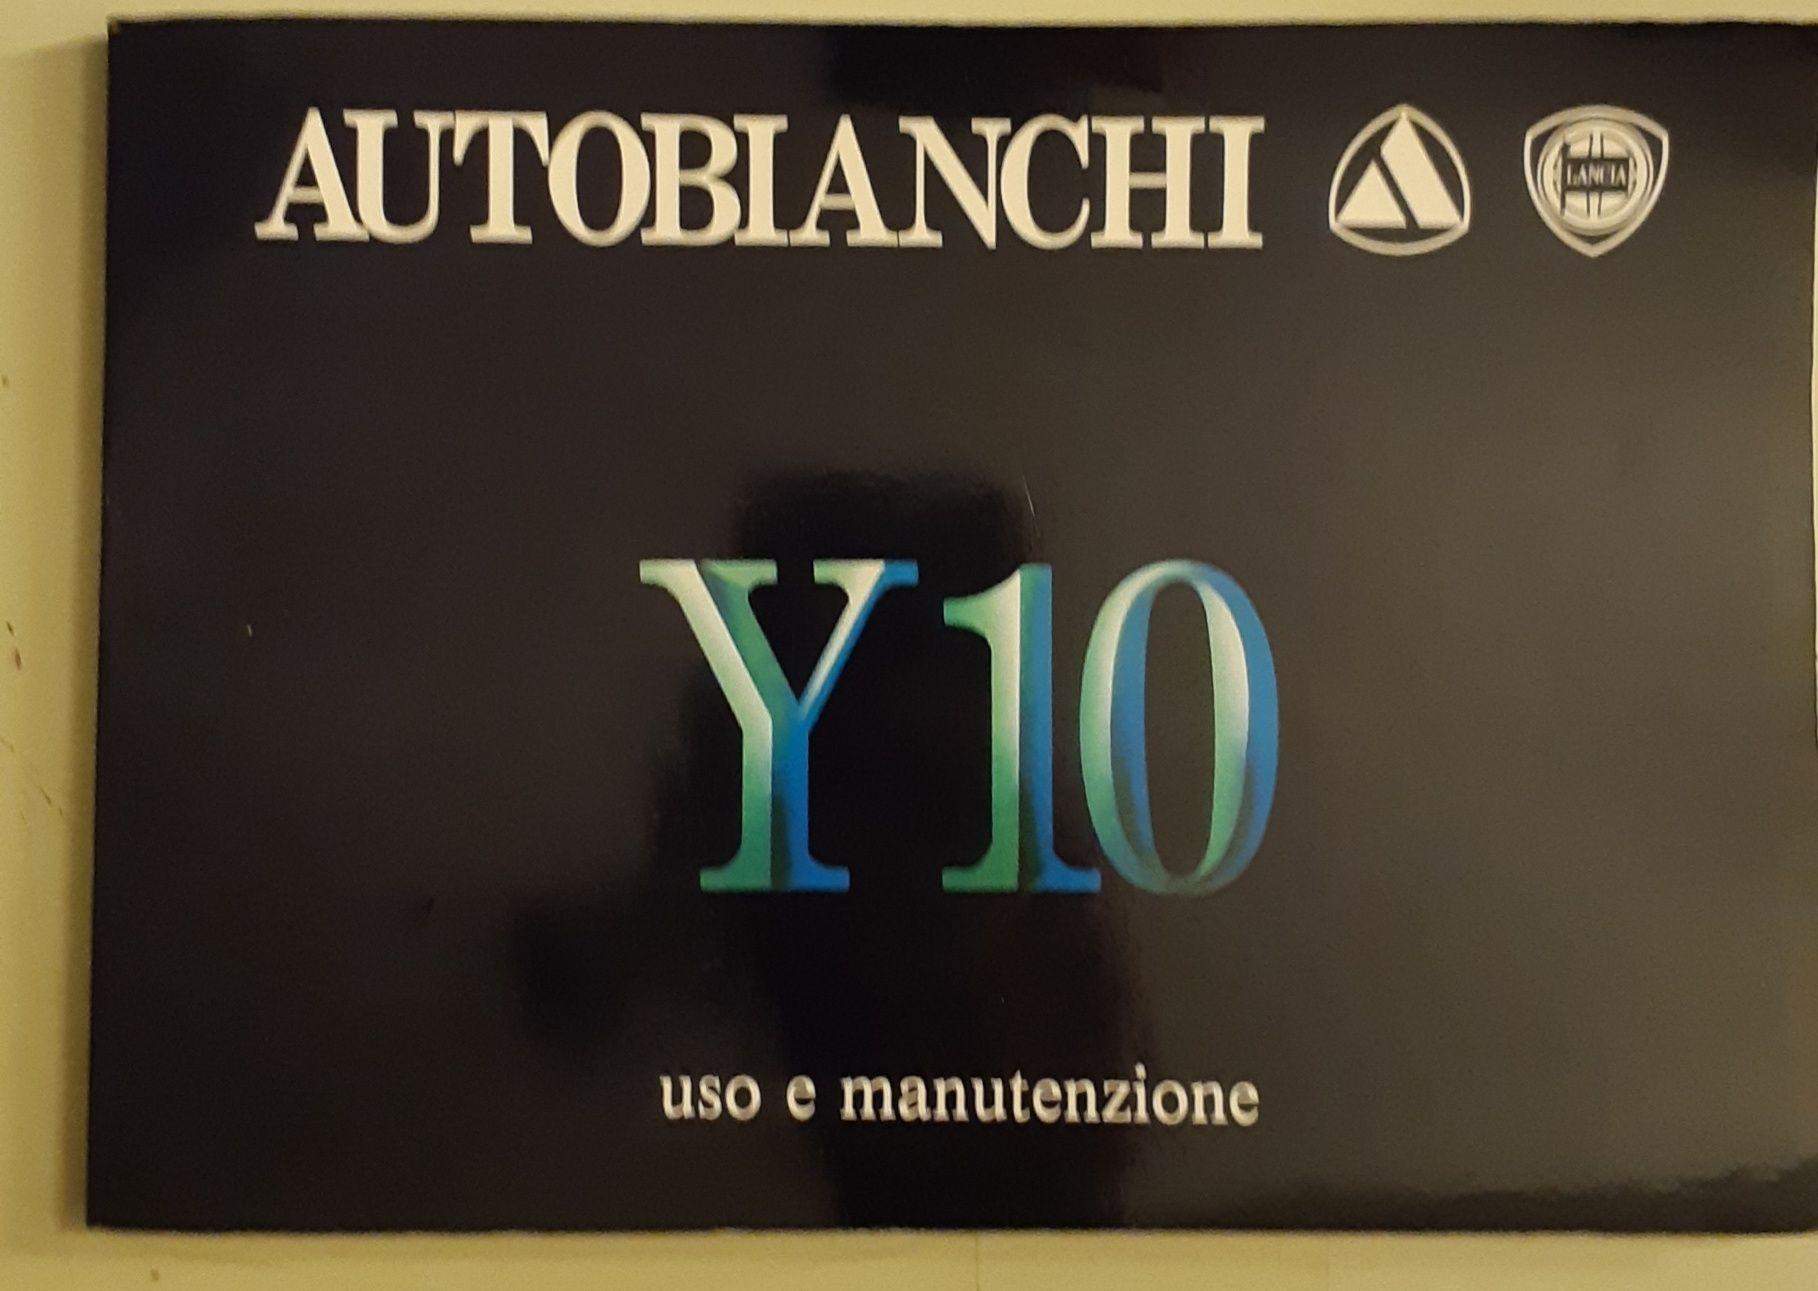 Autobianchi Y10 Manuale do utilizador